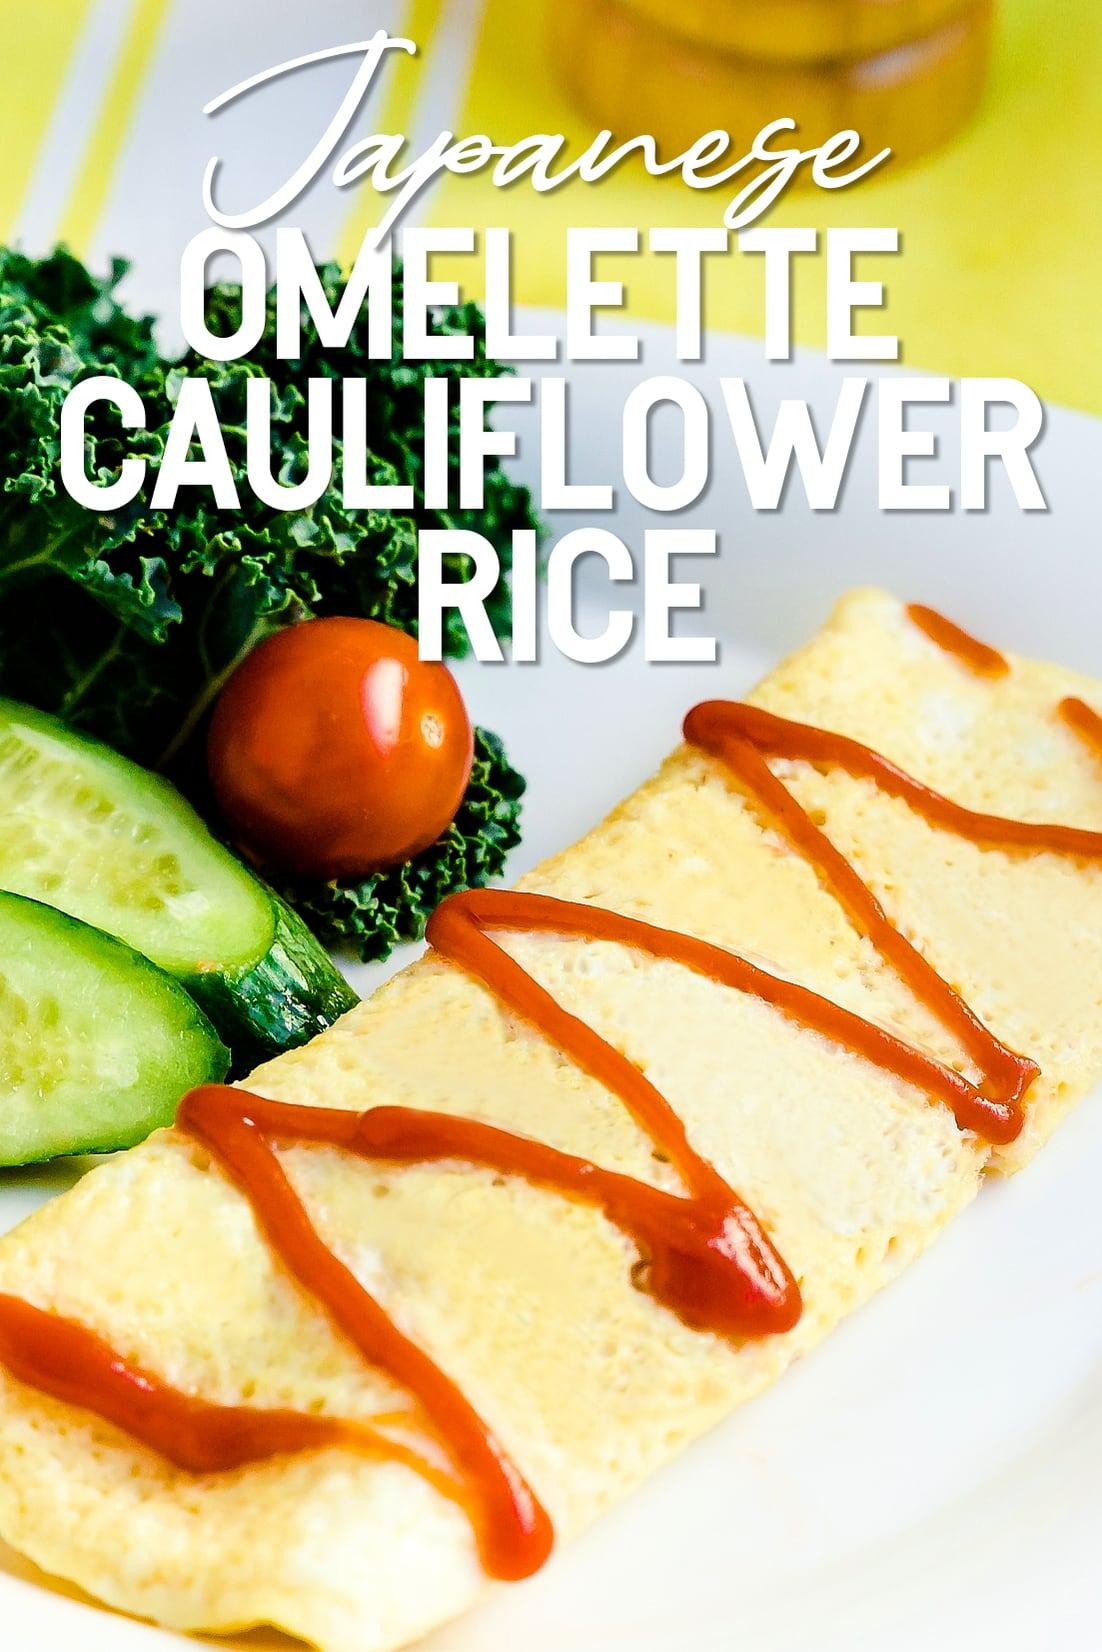 Japanese Omelette Cauliflower Rice close up